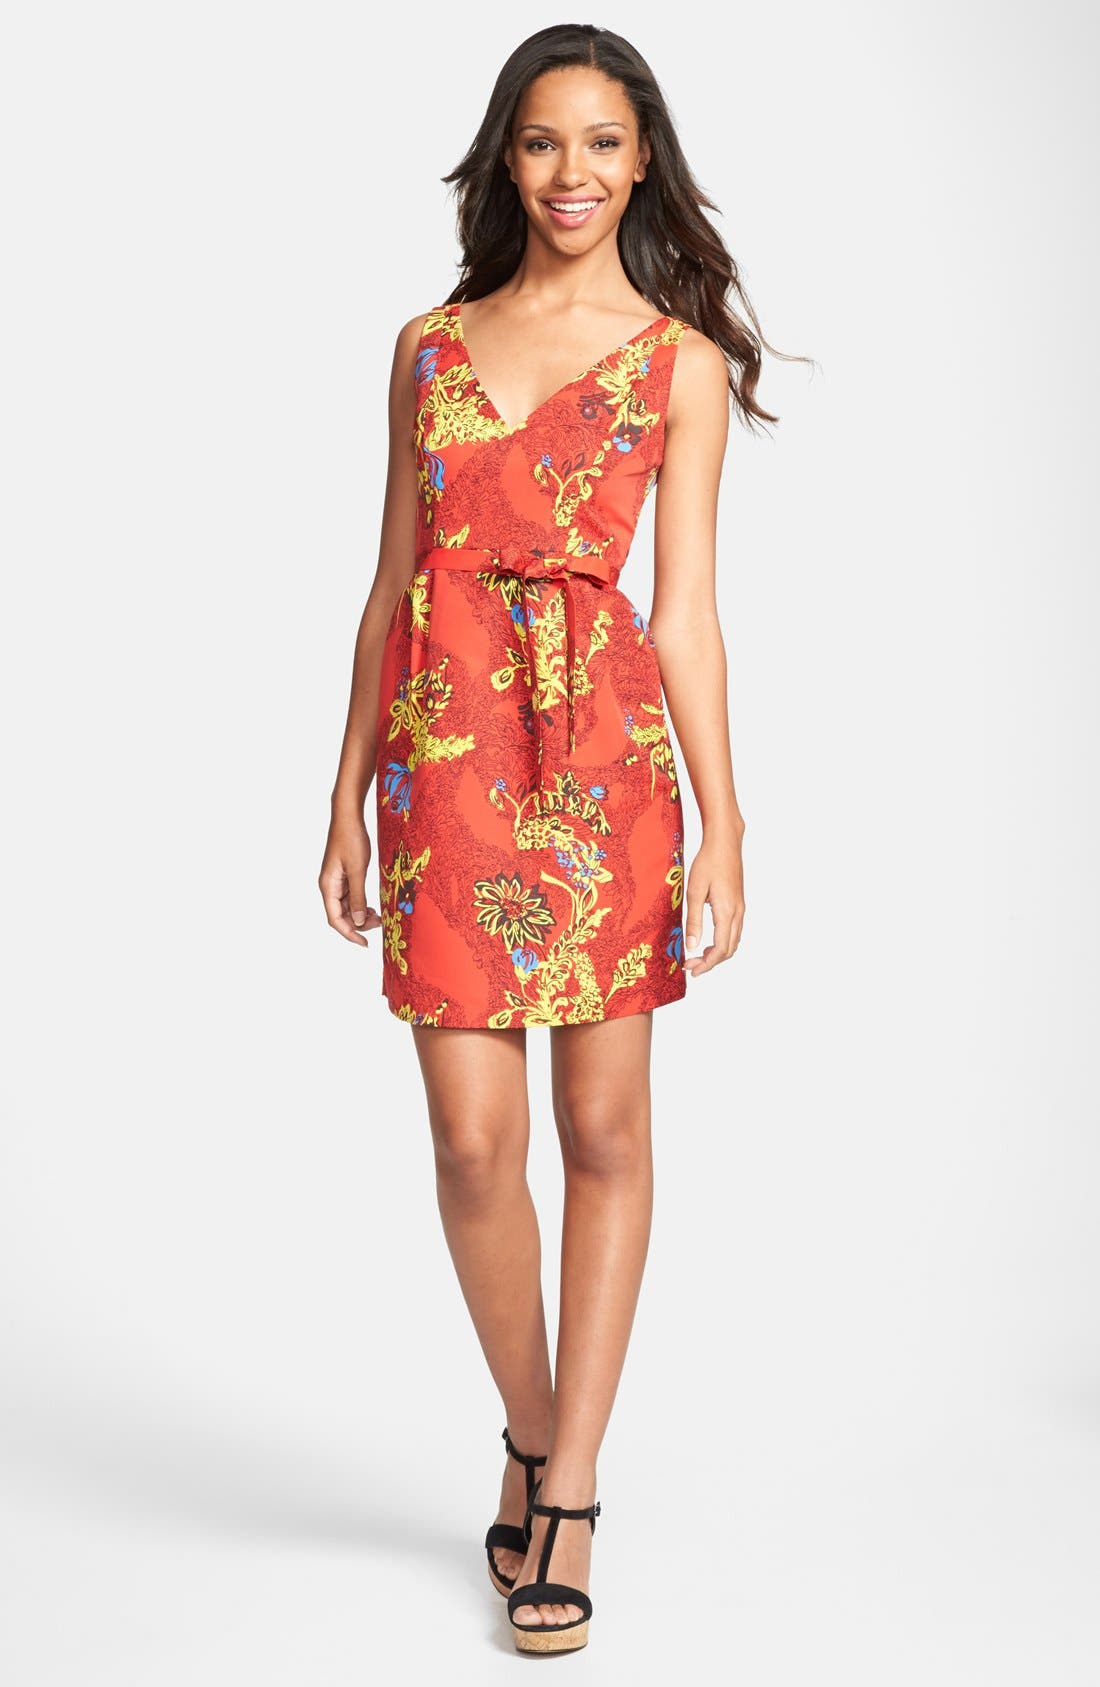 Main Image - Plenty by Tracy Reese 'Ashley' V-Neck Print Dress